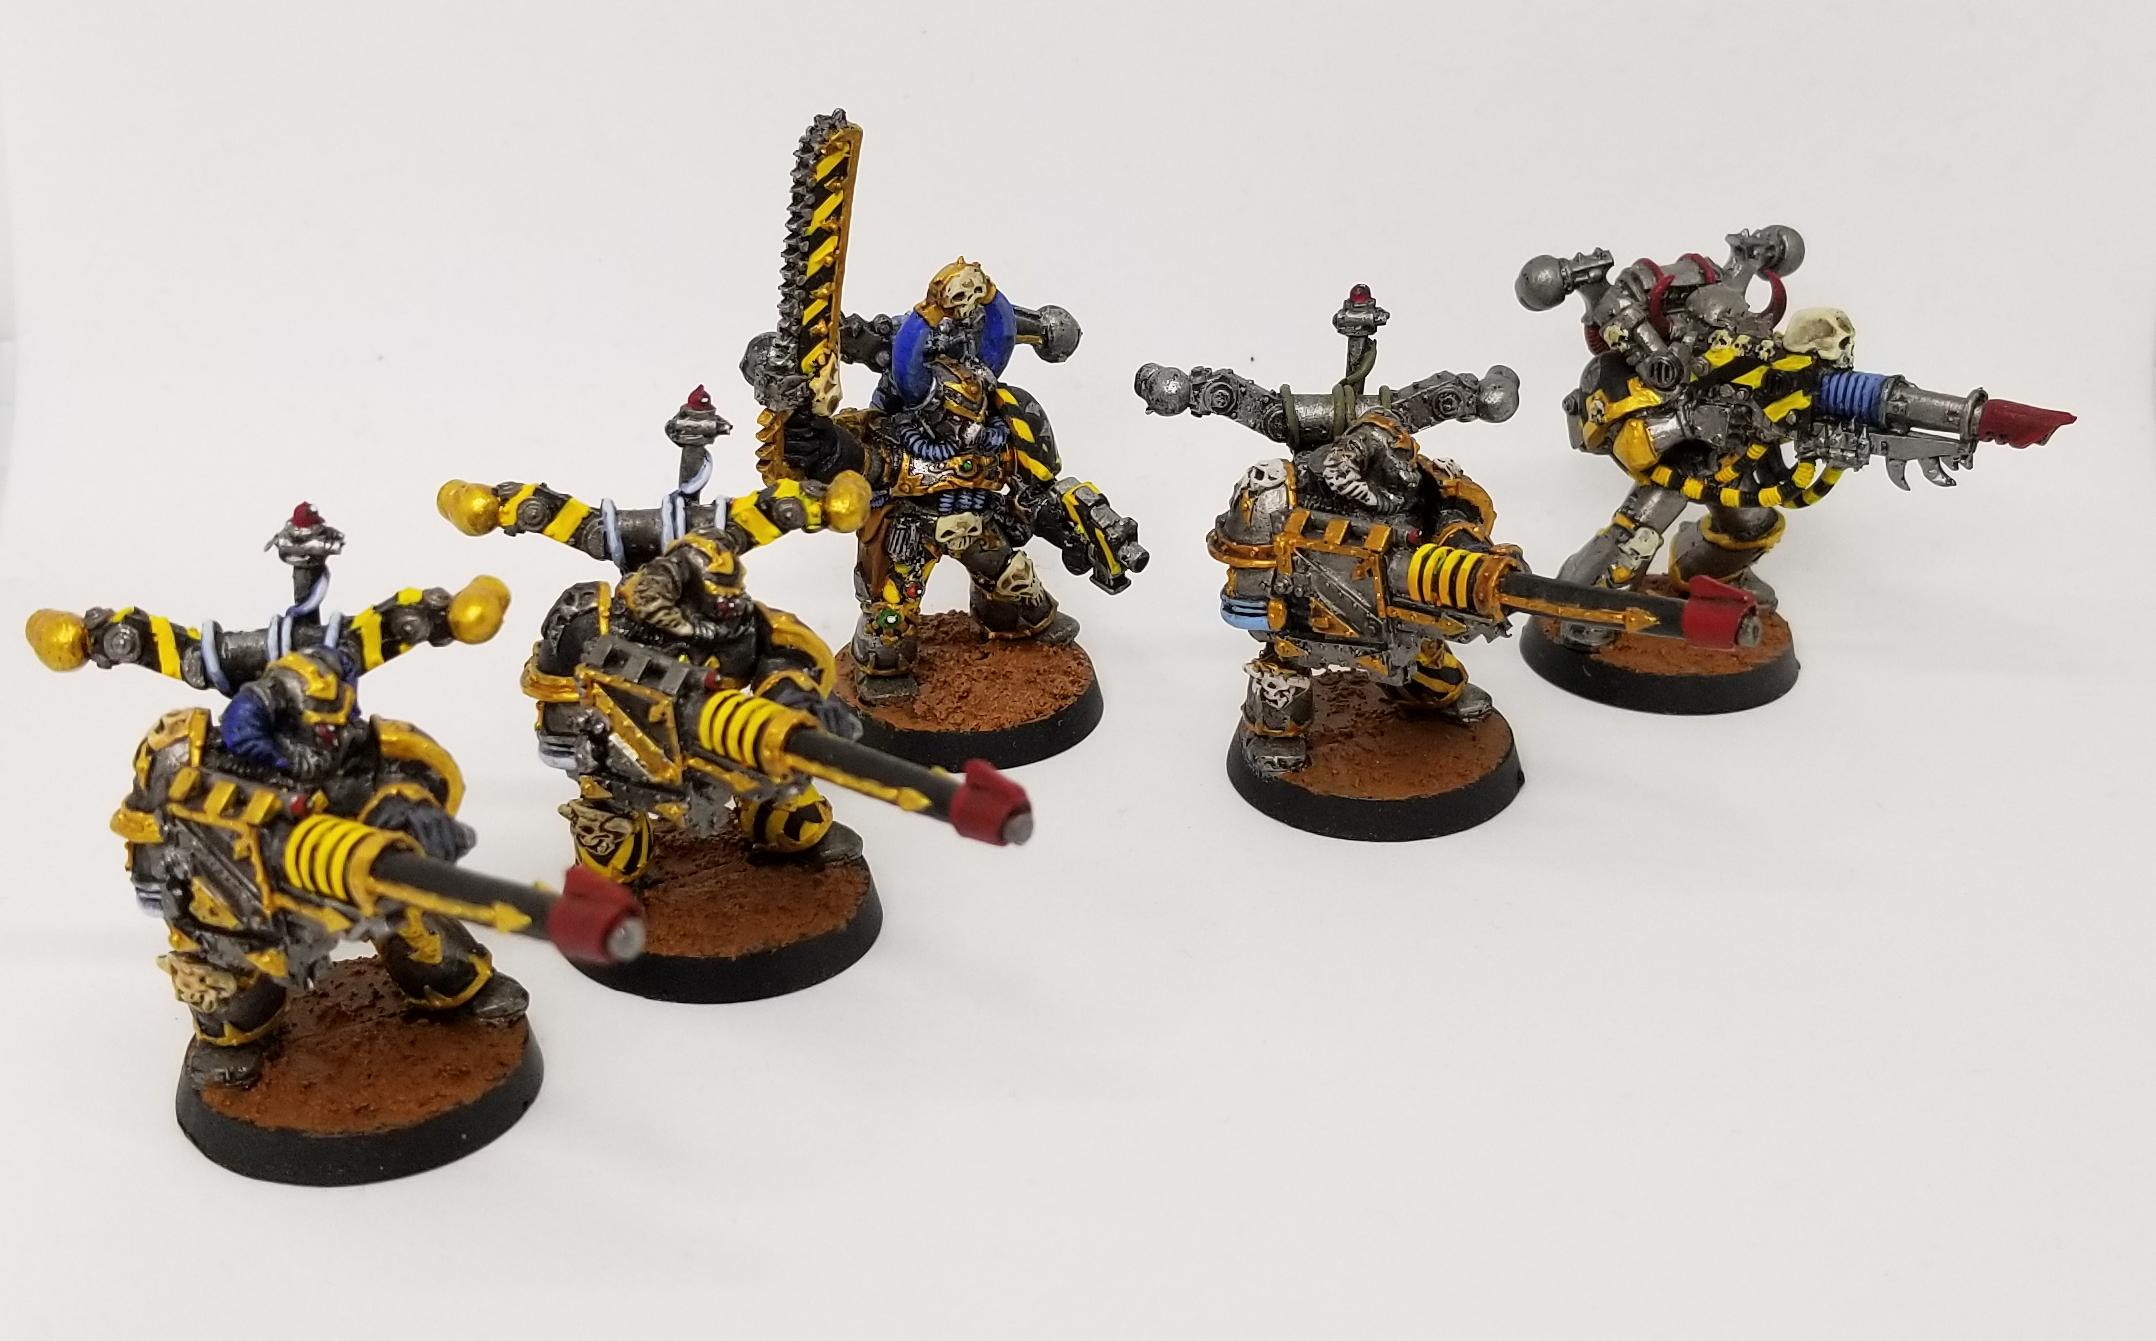 40K Havoc B Heavy Bolter Autocannon Chaos Marines Warhammer Heretic Black Legion